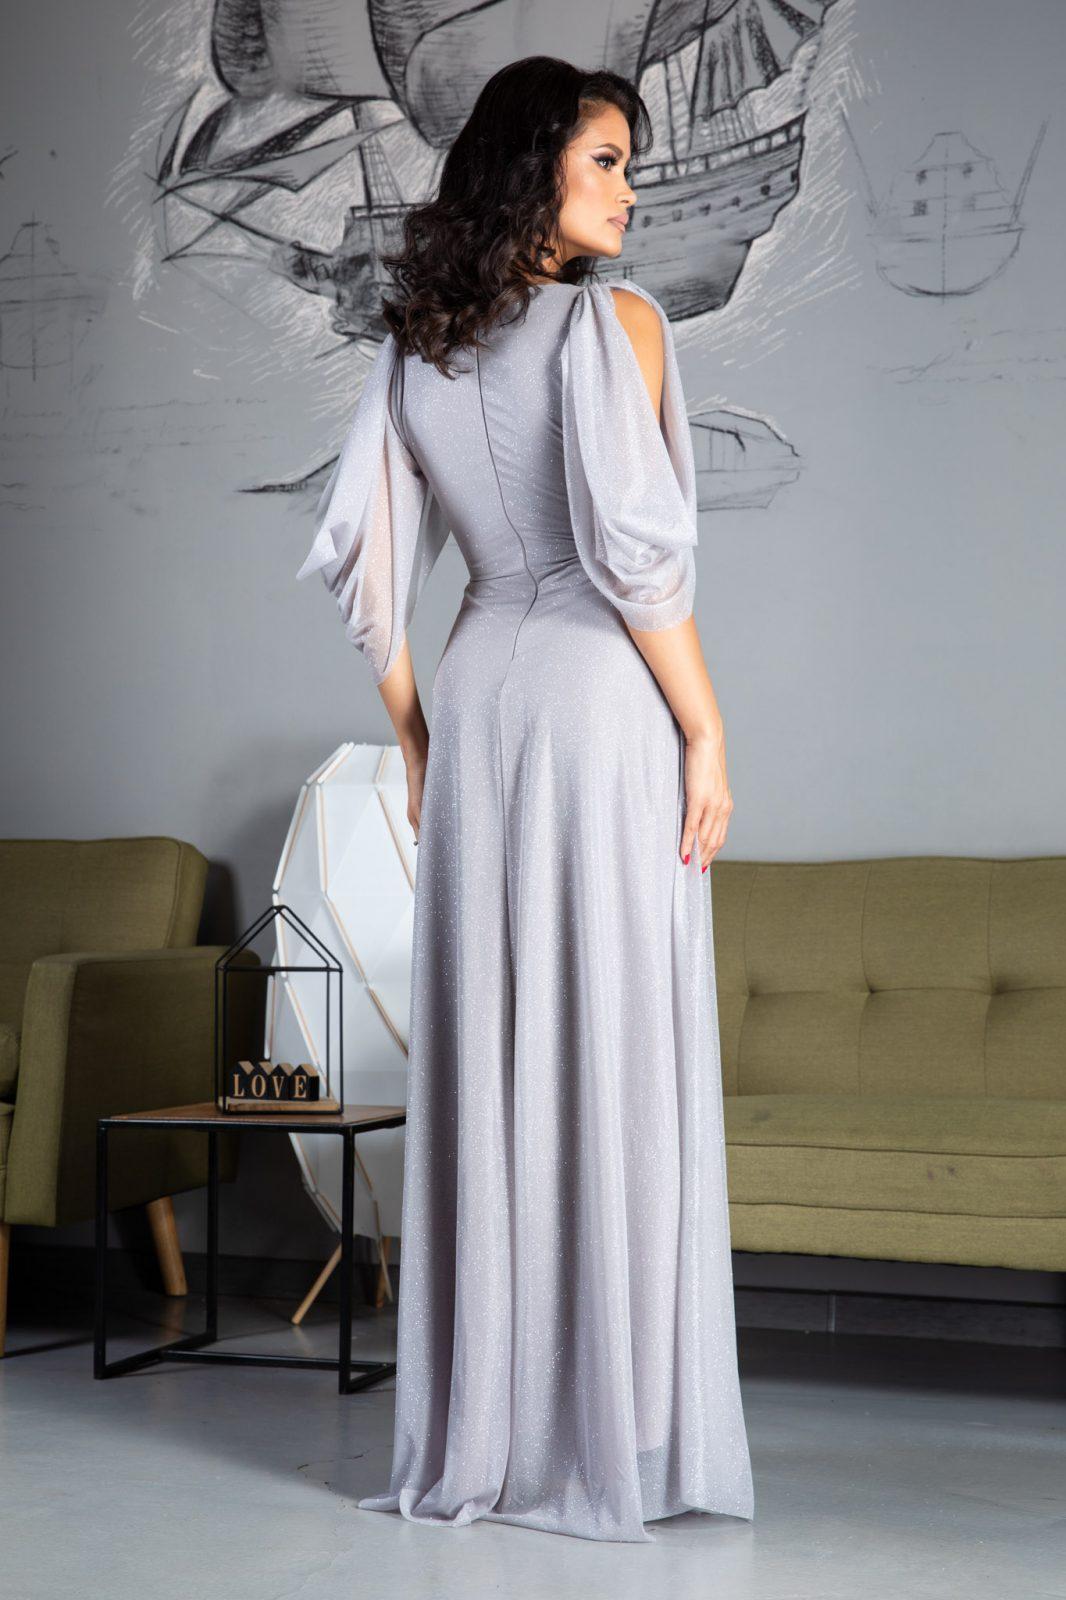 Teresa Maxi Γκρι Φόρεμα 5029 1